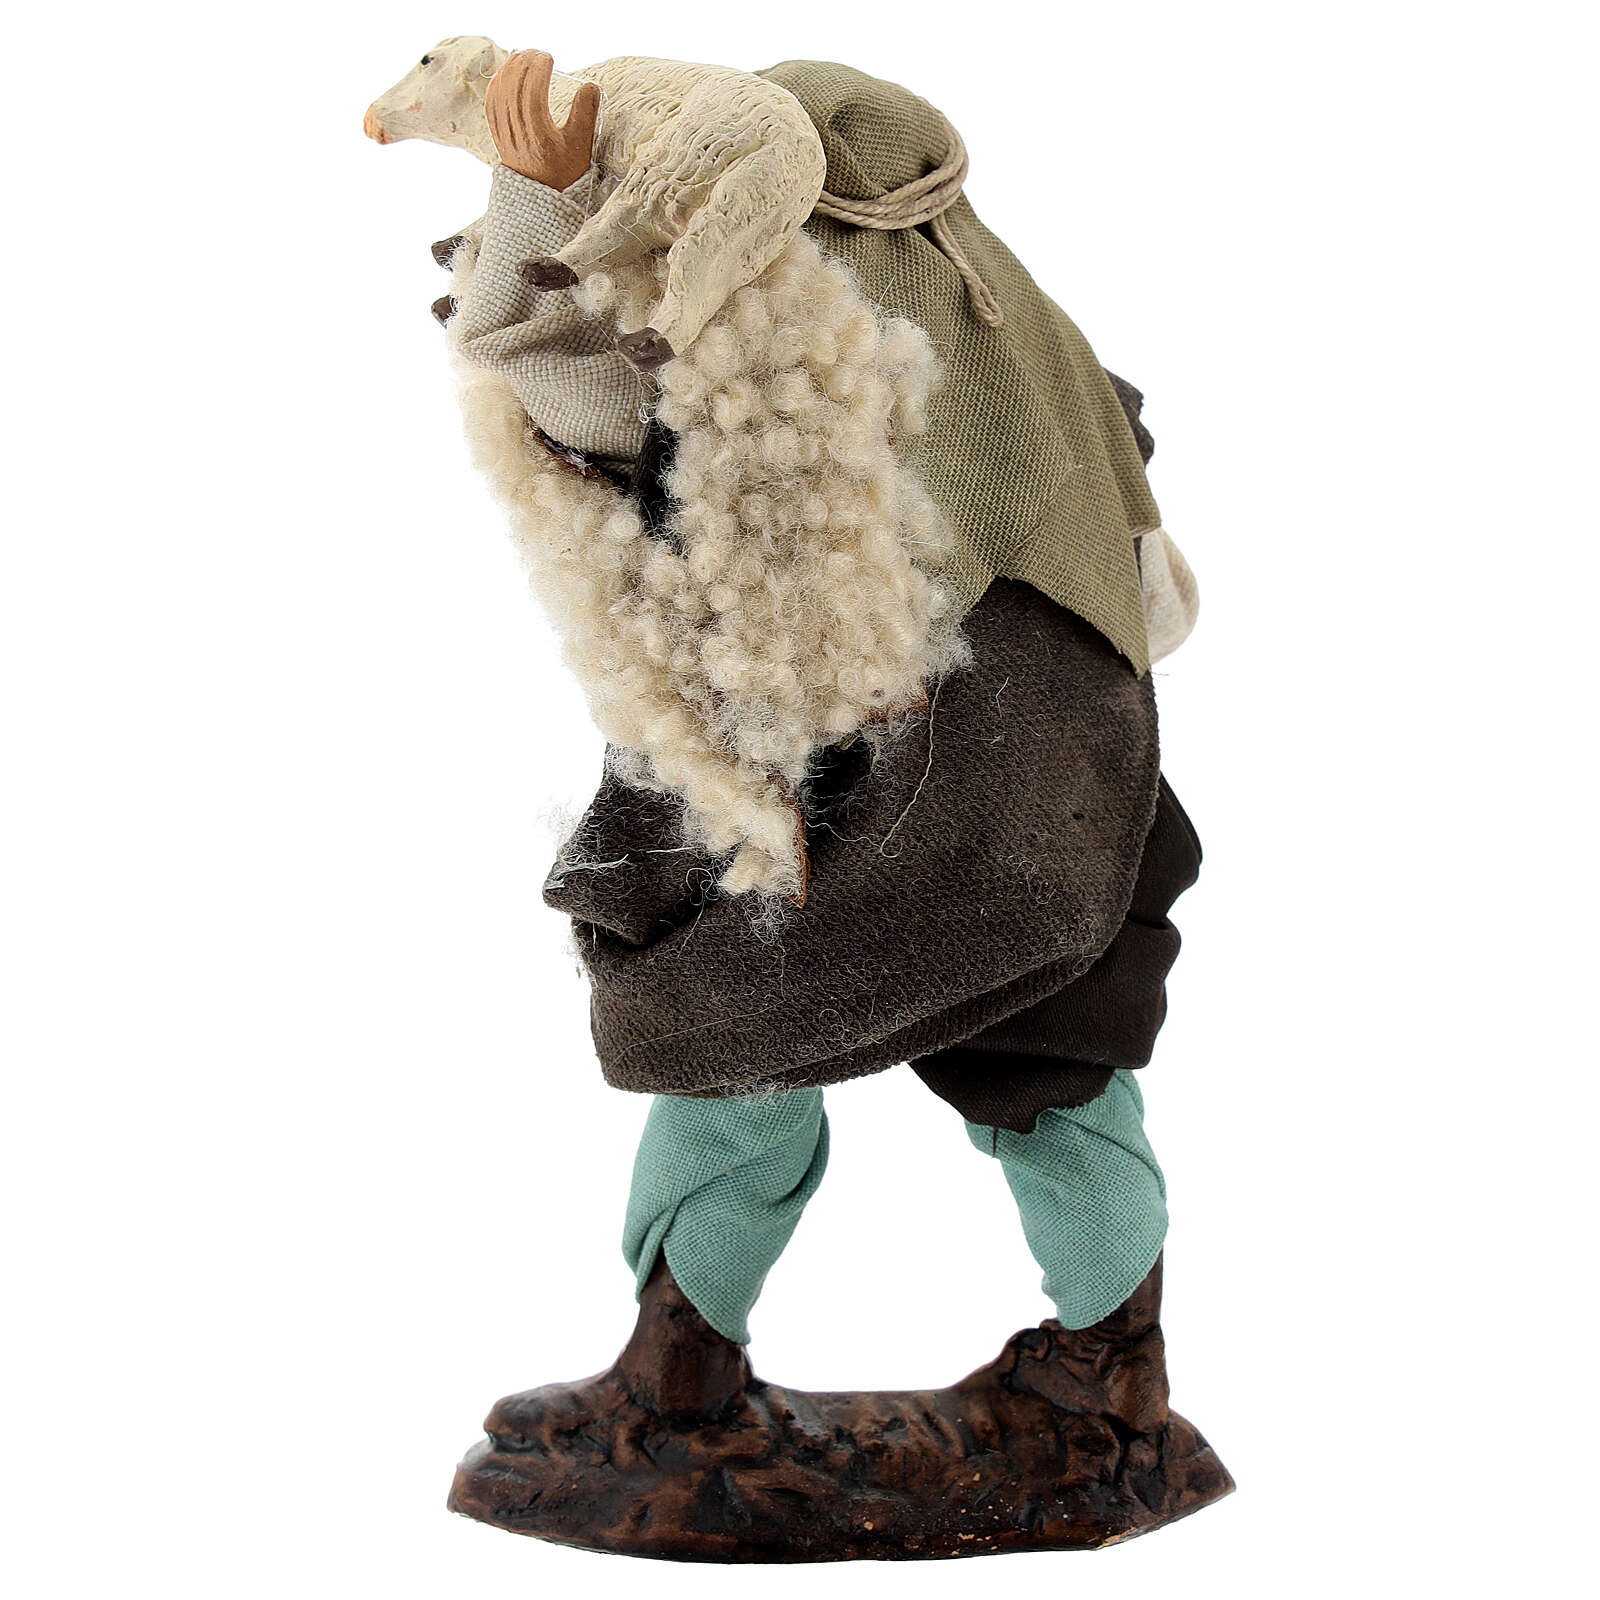 Shepherd with sheep in arms terracotta, 12 cm Neapolitan nativity 4